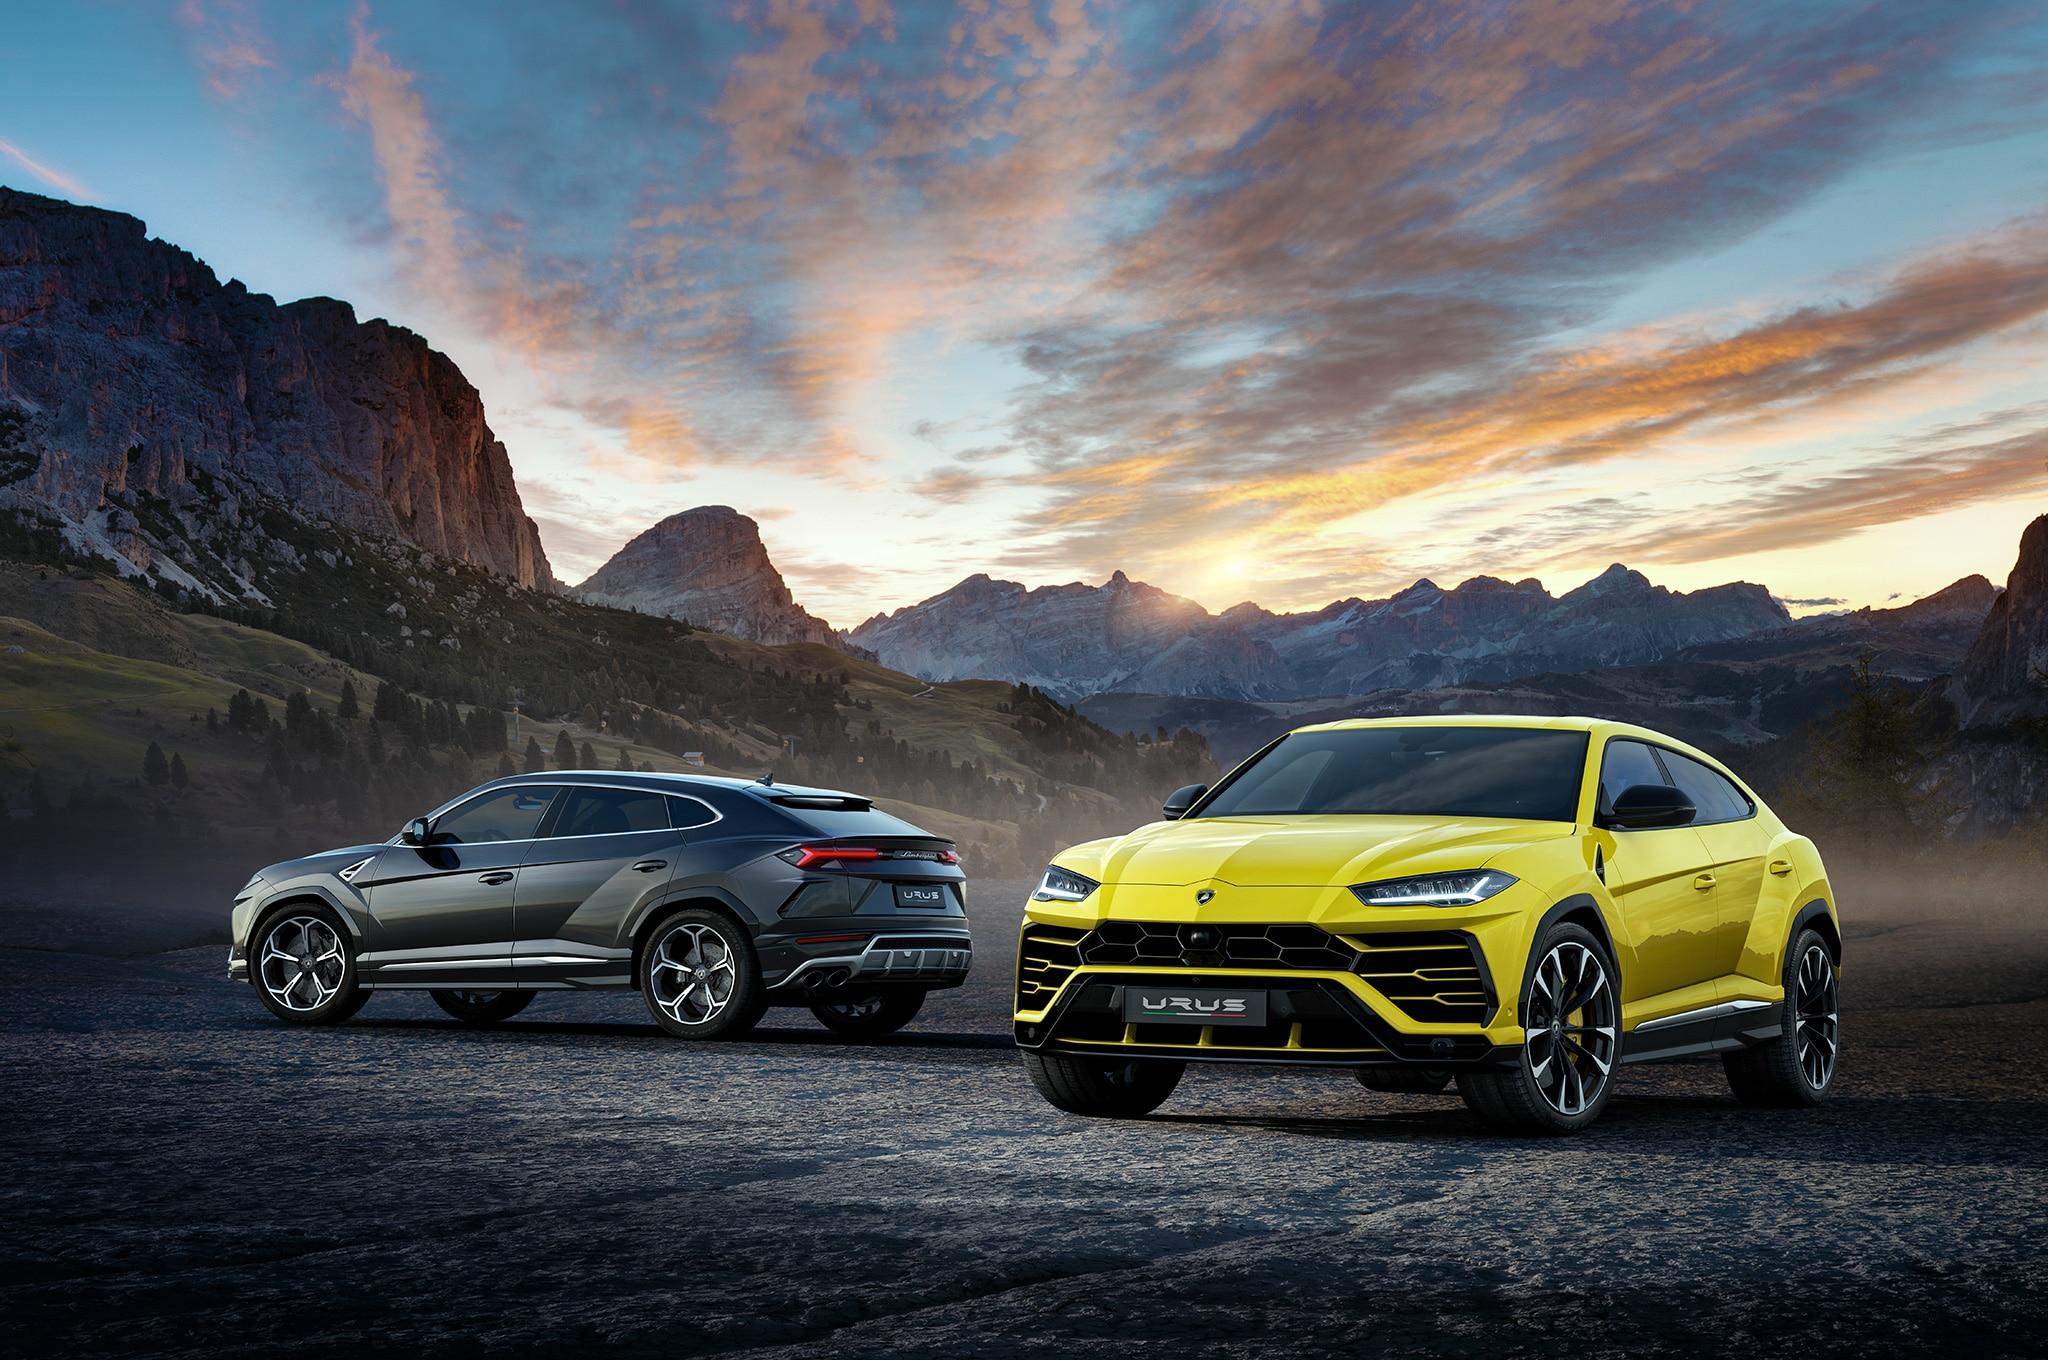 2019-Lamborghini-Urus-front-and-rear-side-views.jpg